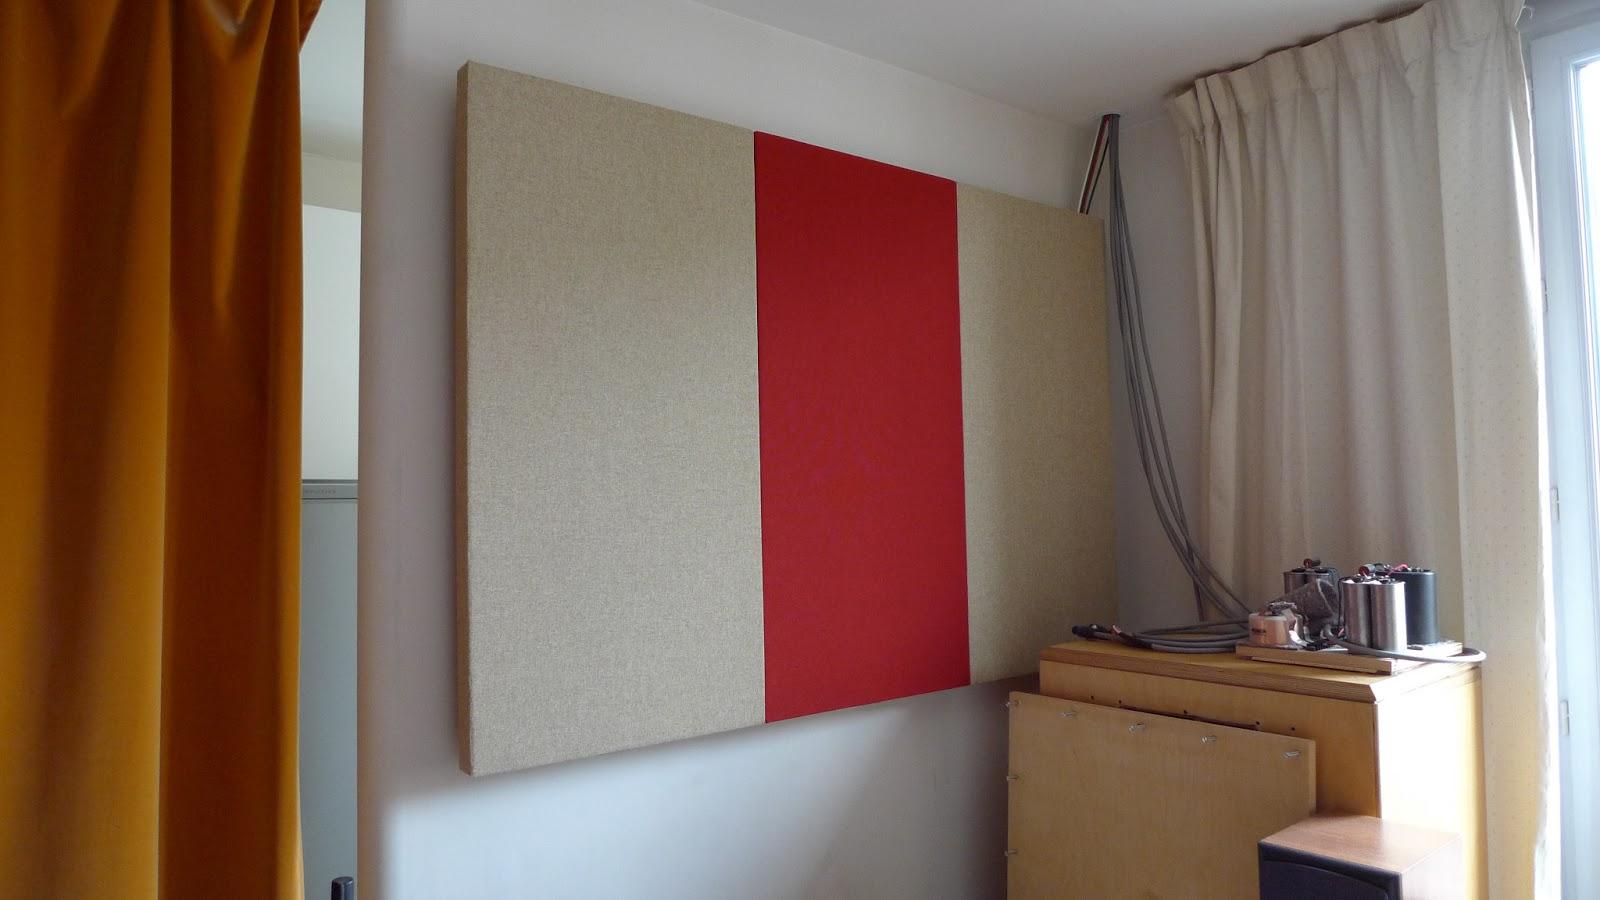 test traitement mur version imprimable. Black Bedroom Furniture Sets. Home Design Ideas